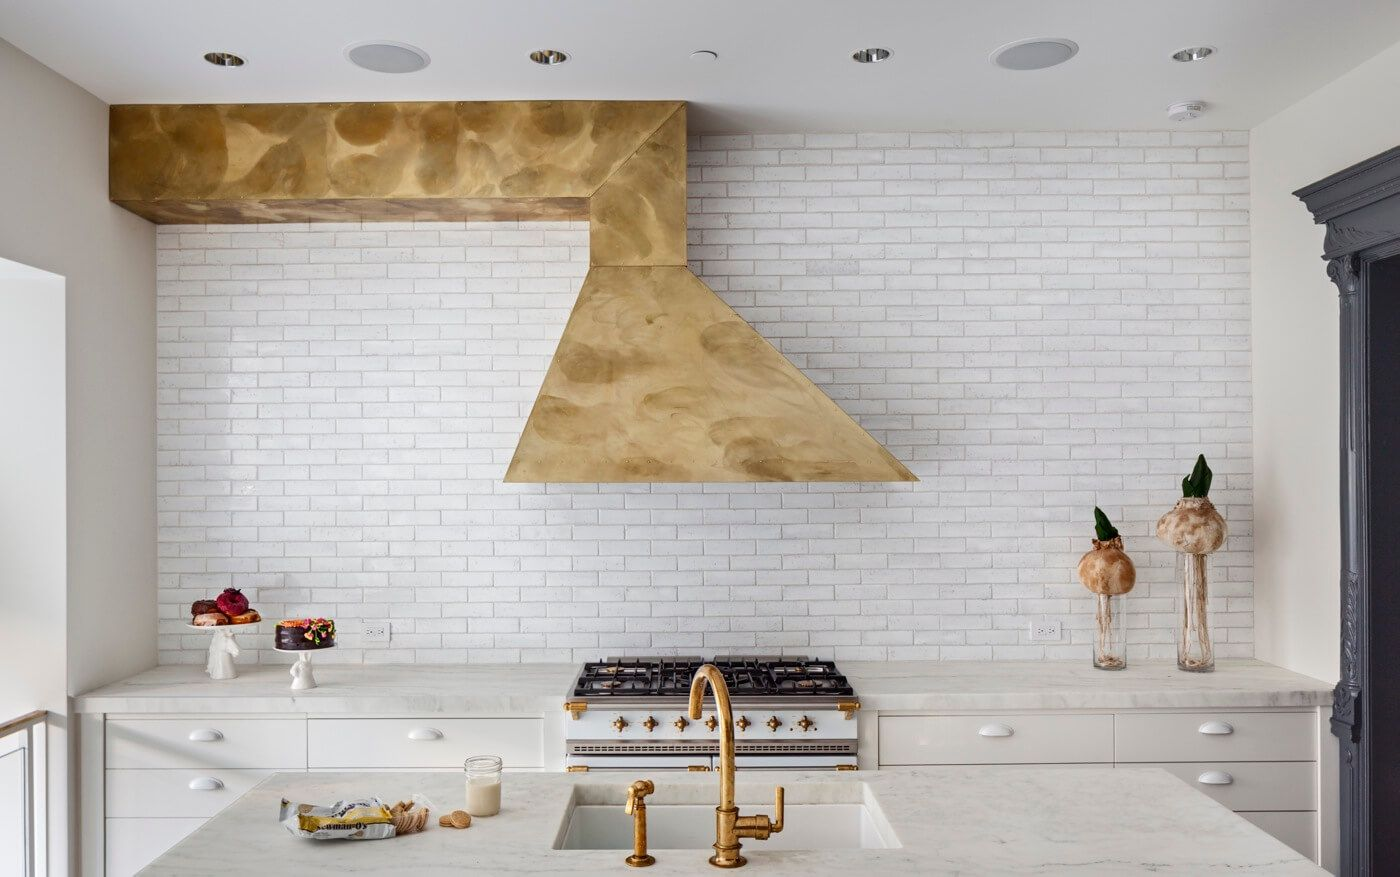 The Insider Designer Evokes Both Dusky Glamour And Bright Modernity In Park Slope Townhouse Remodeling Inspiration Interior Design Inspiration Kitchen Range Hood